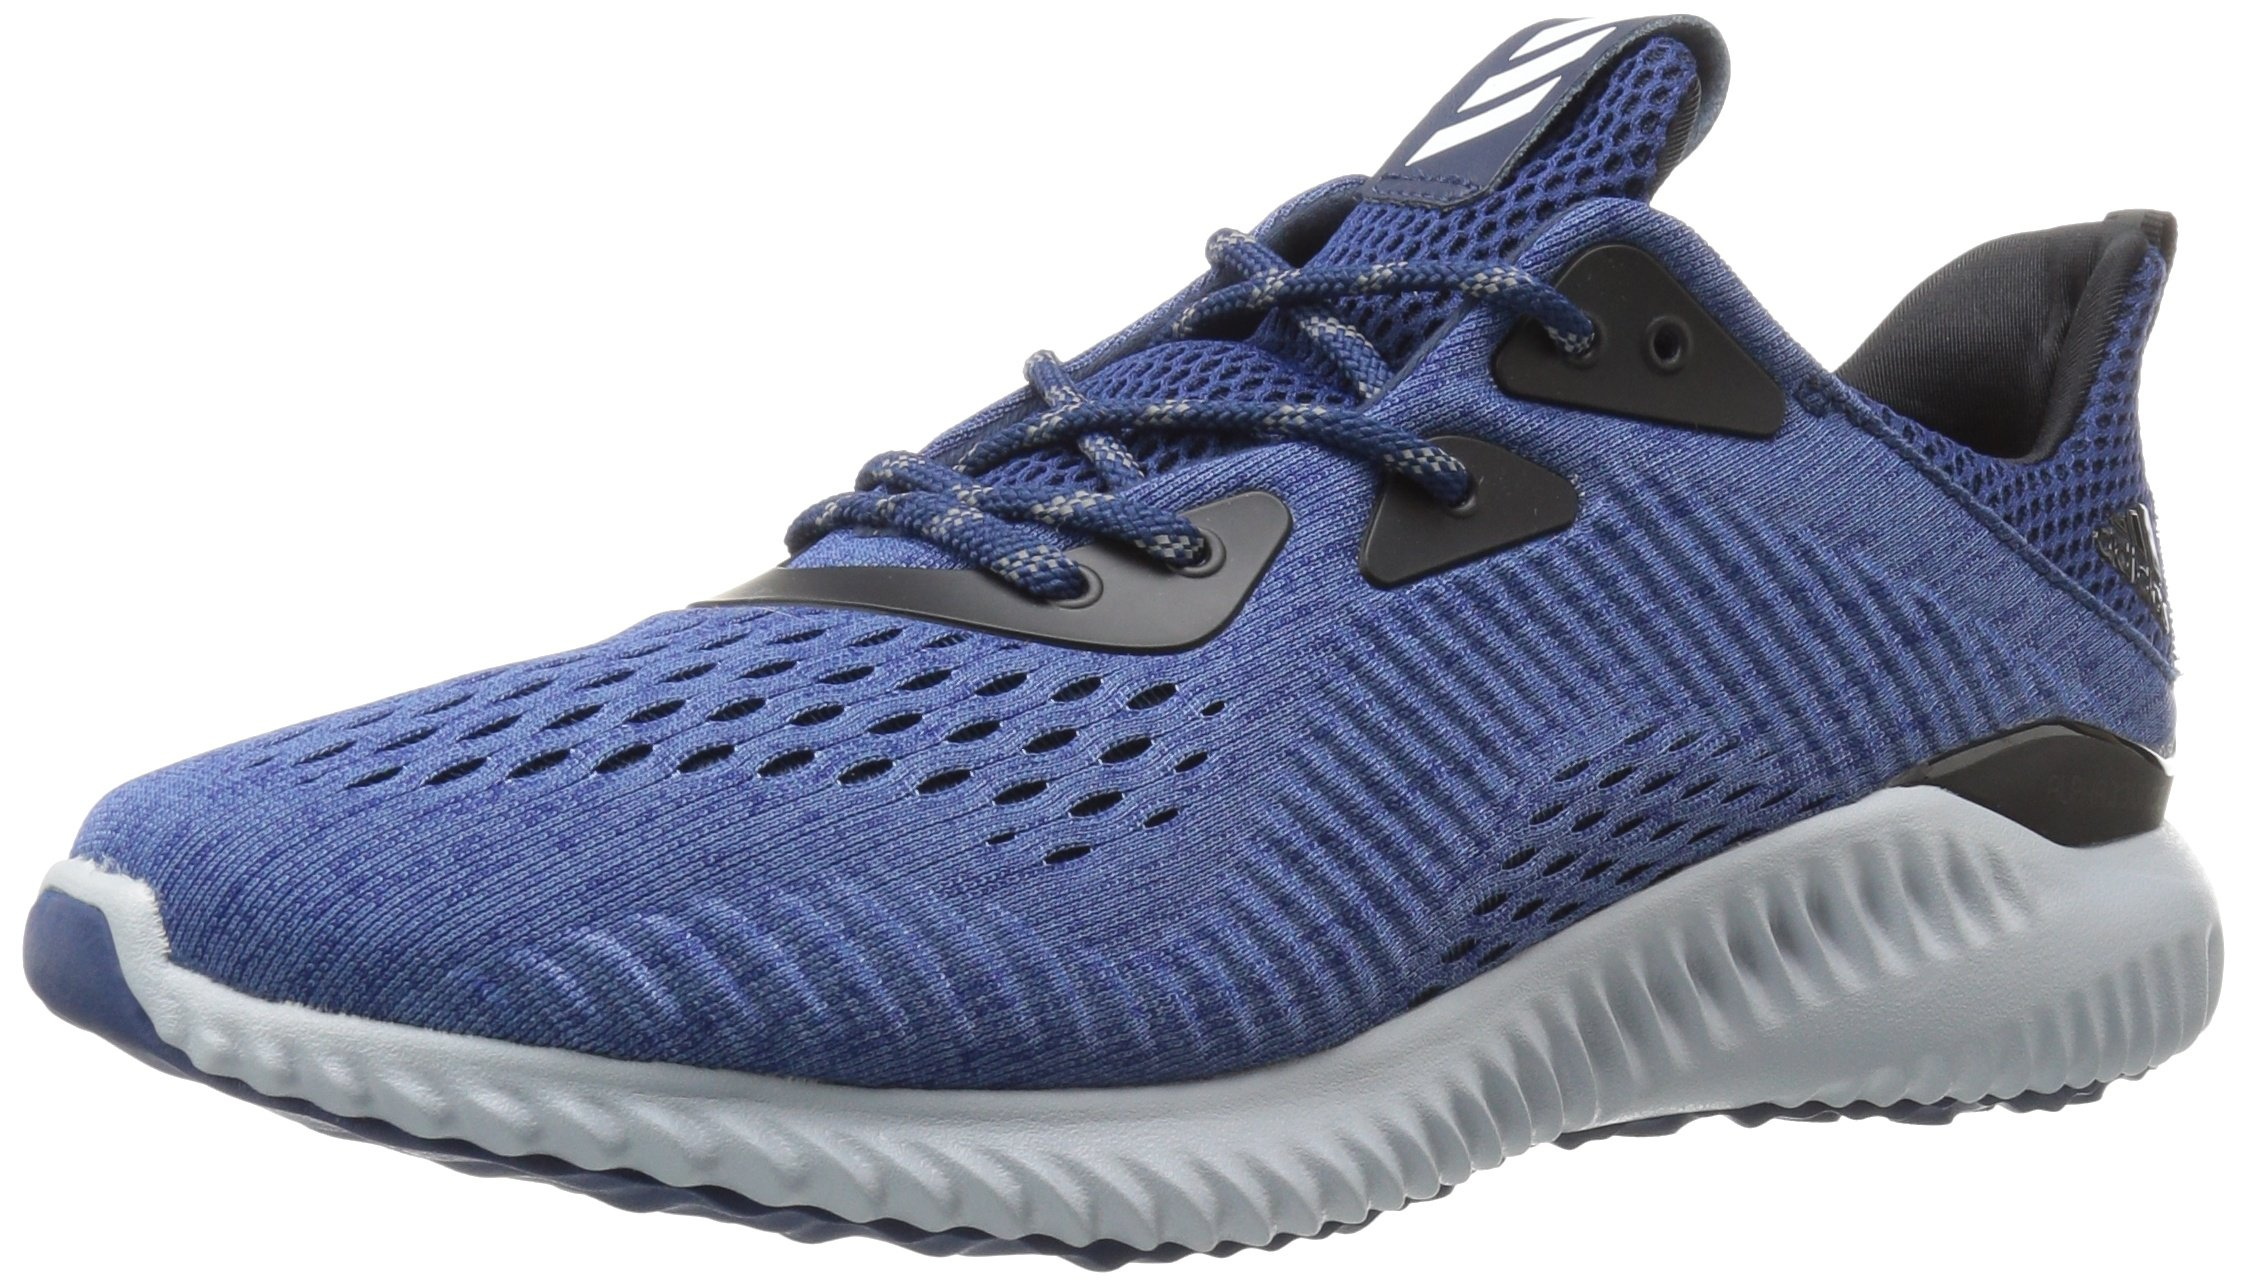 adidas Men's Alphabounce EM M Running Shoe, Collegiate Navy/Utility Black/Mystery Blue, 10 M US by adidas